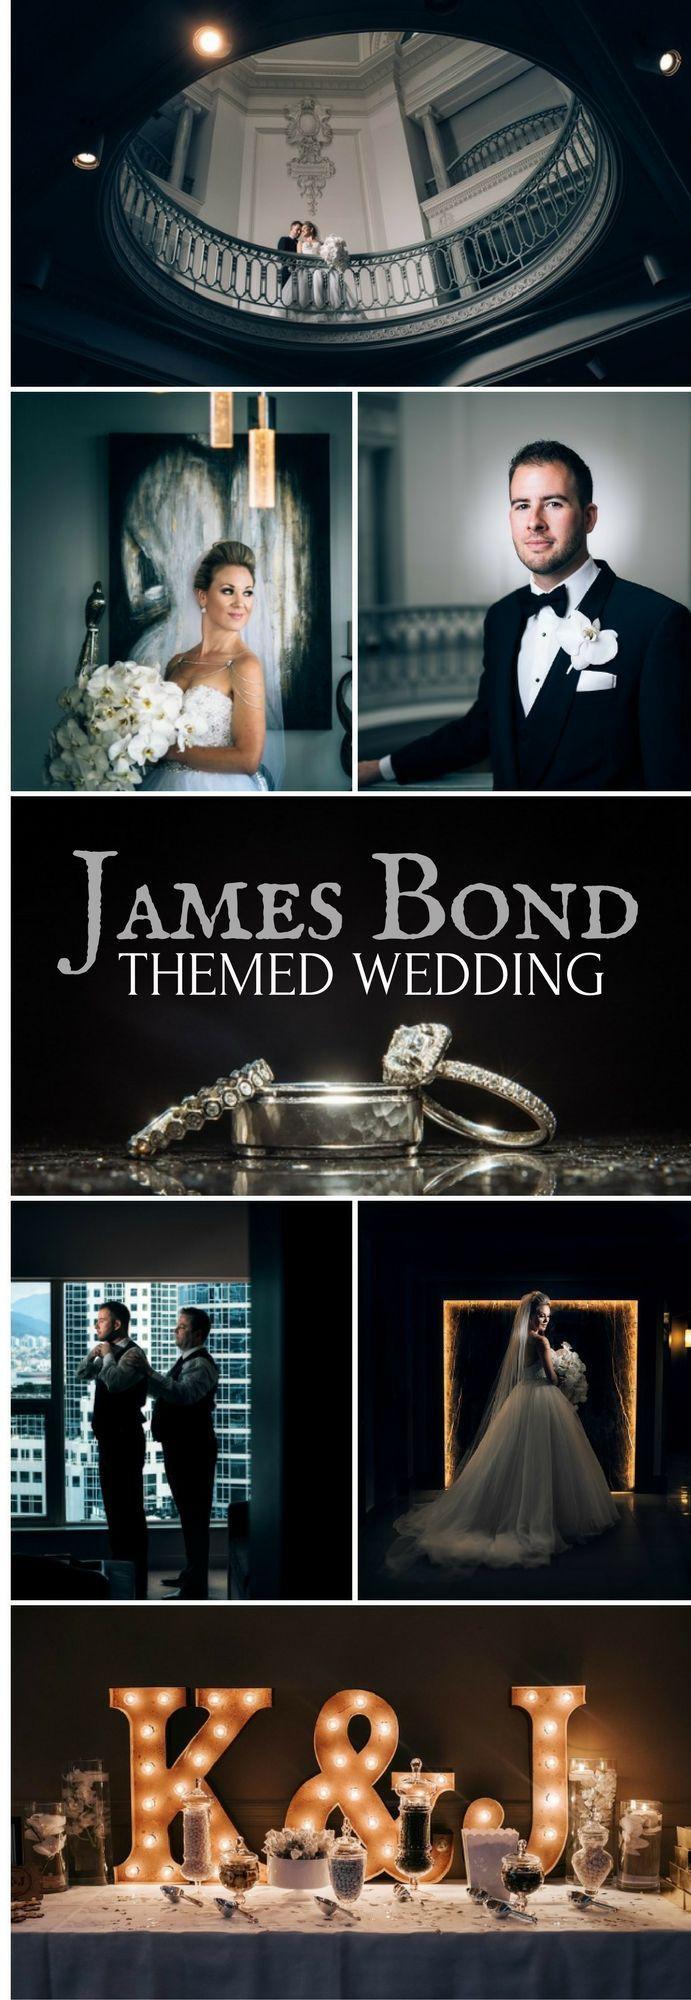 James Bond Themed Wedding | Elegant and Romantic Movie Inspired Wedding Idea